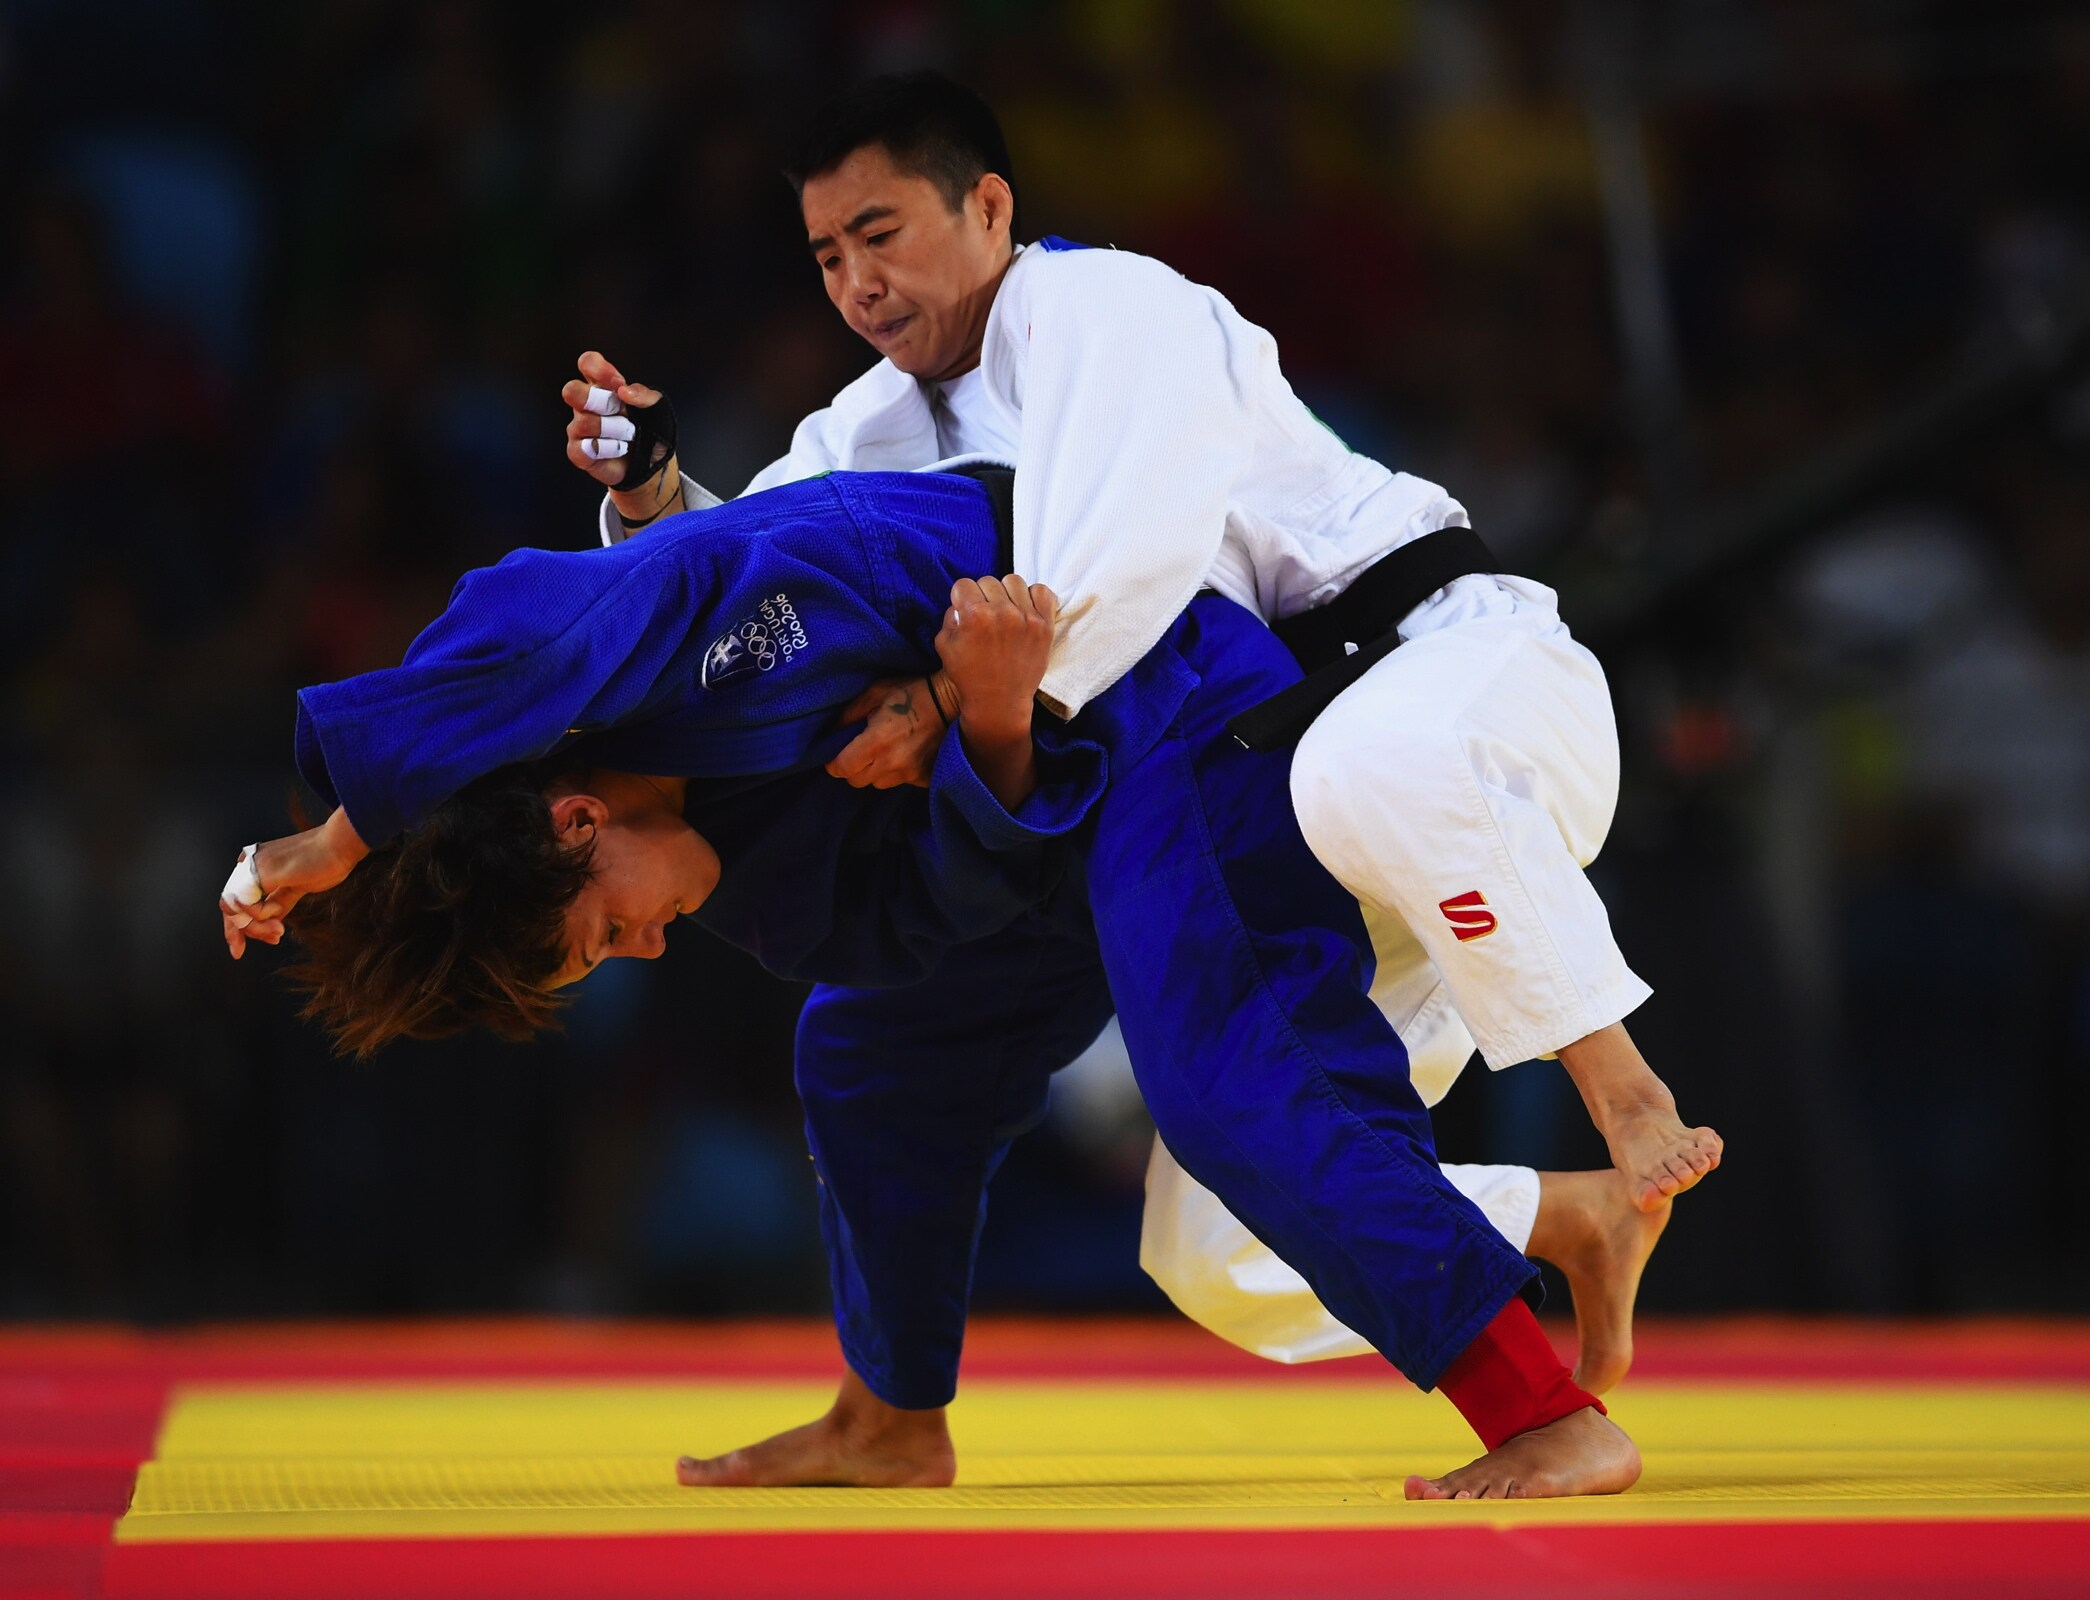 Judo - 52kg (Half-lightweight) Women